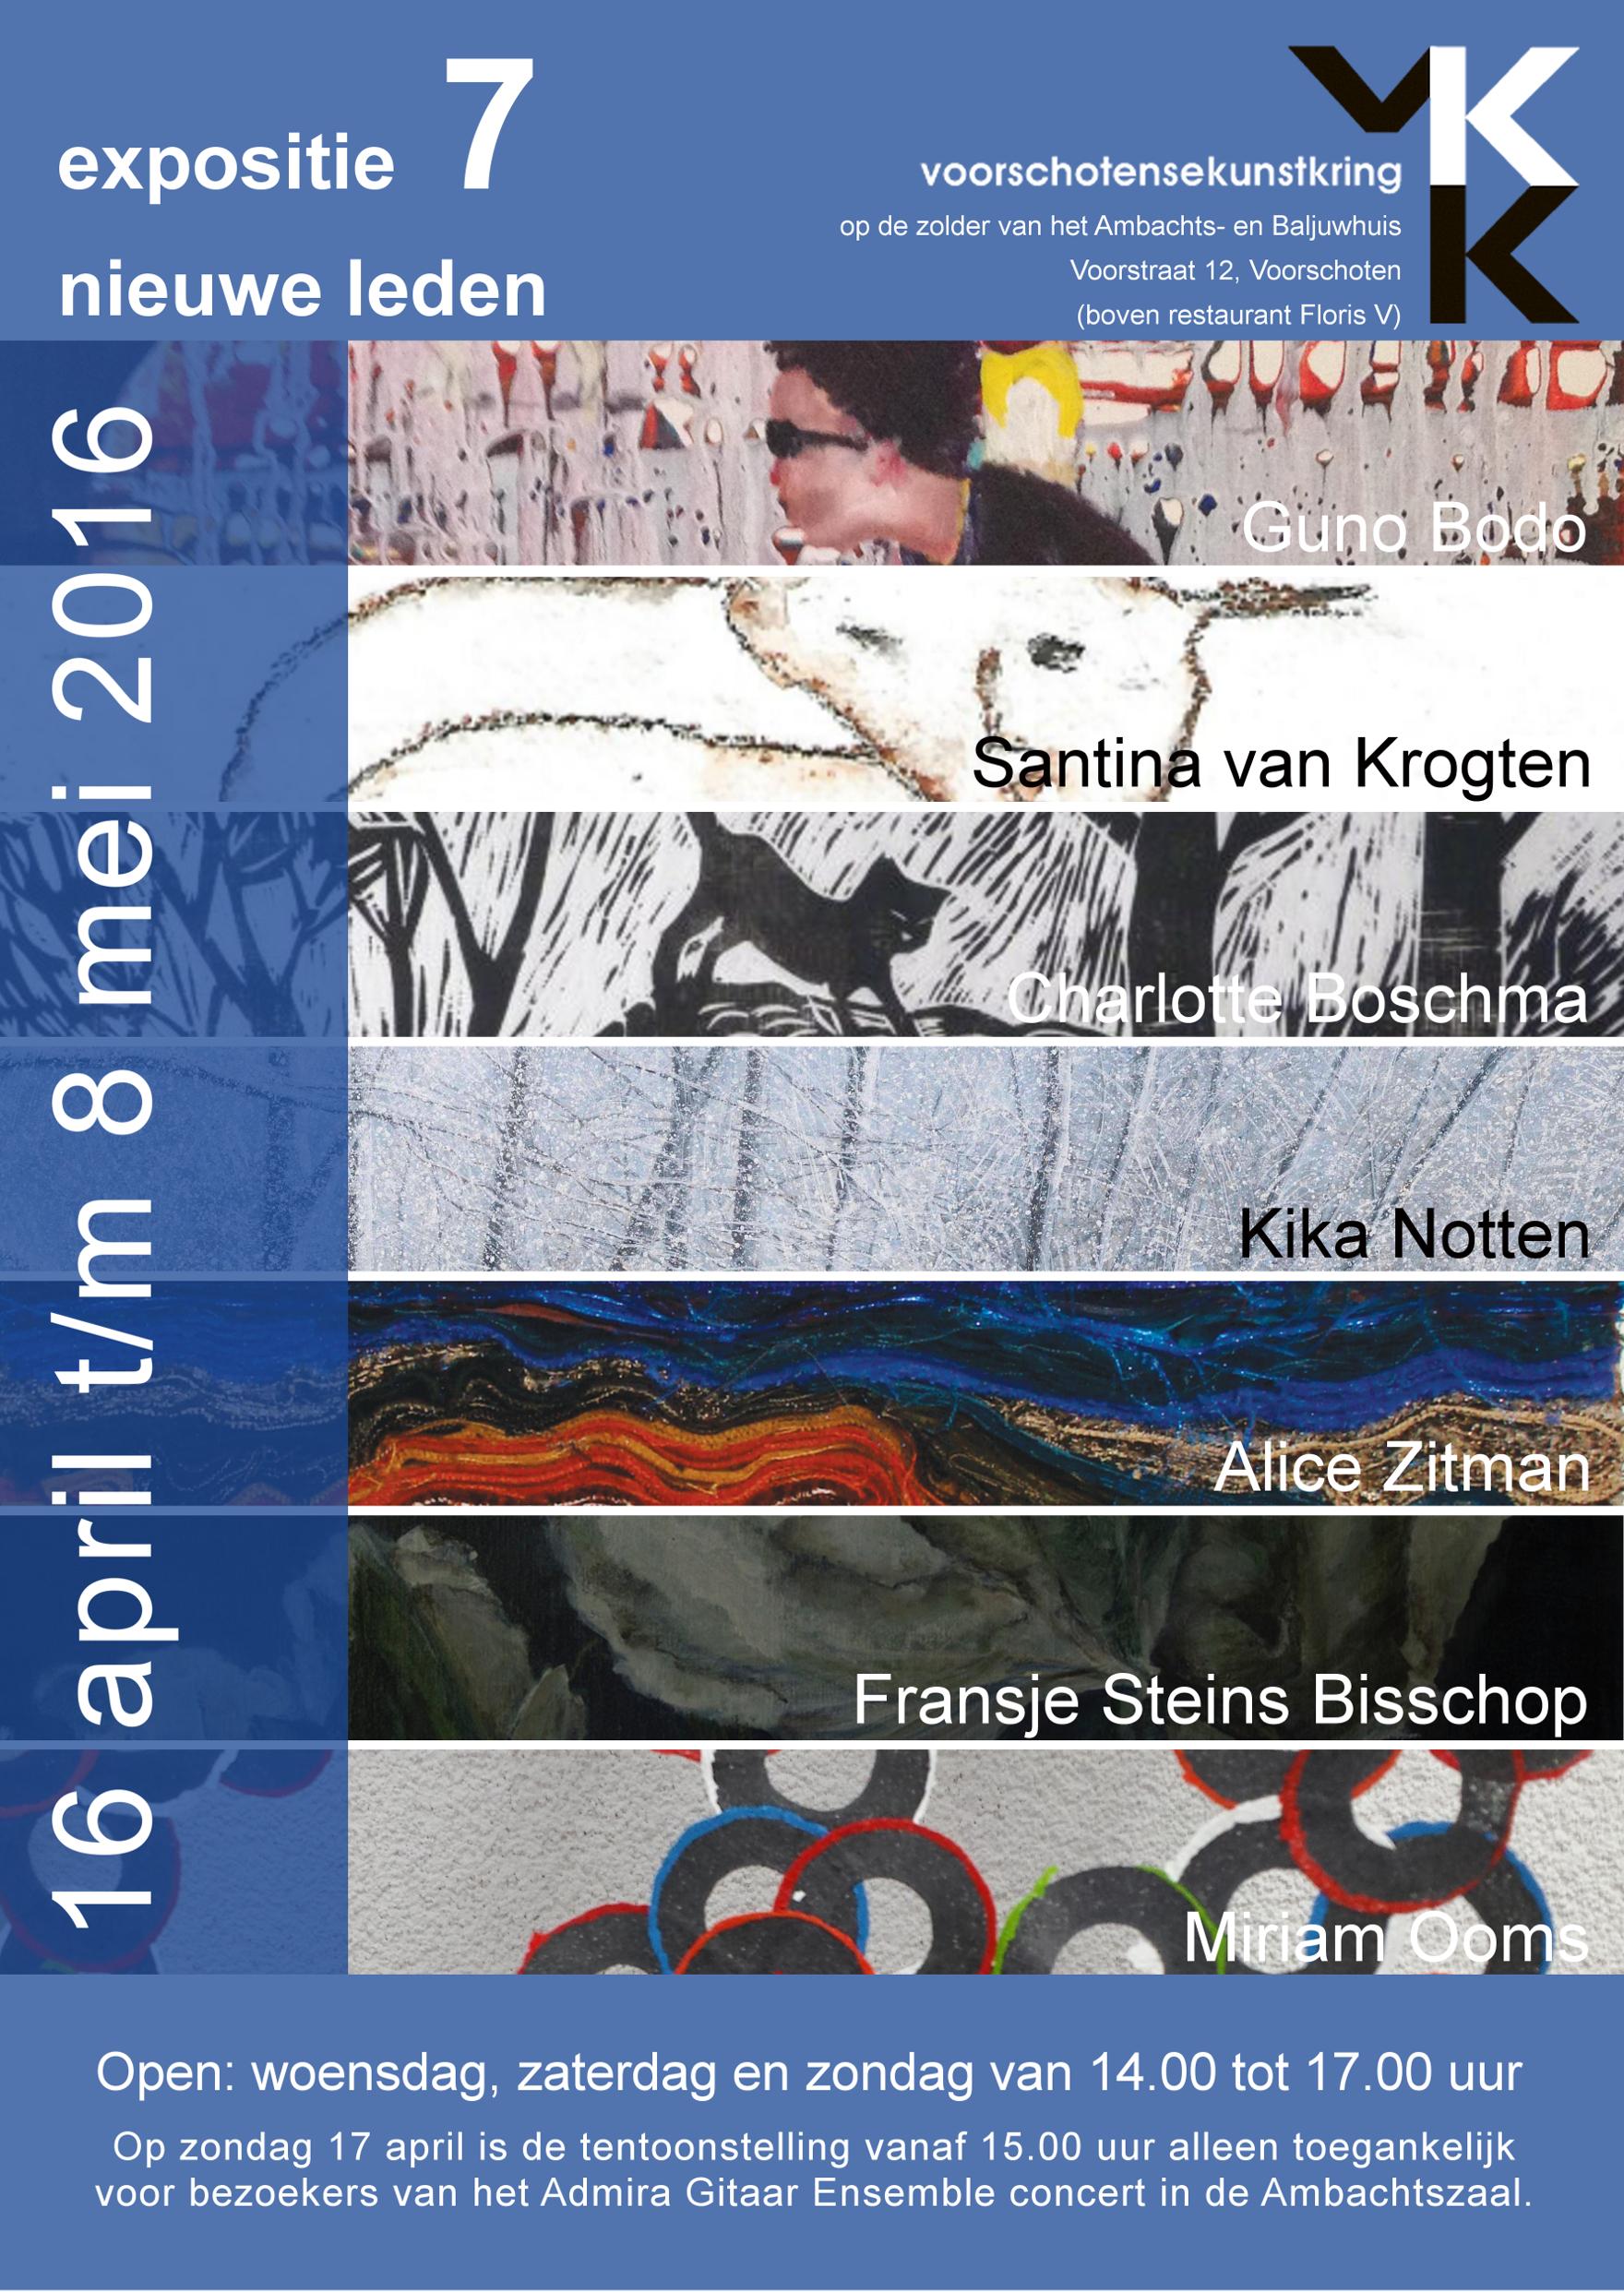 VKK-expositie april 2016